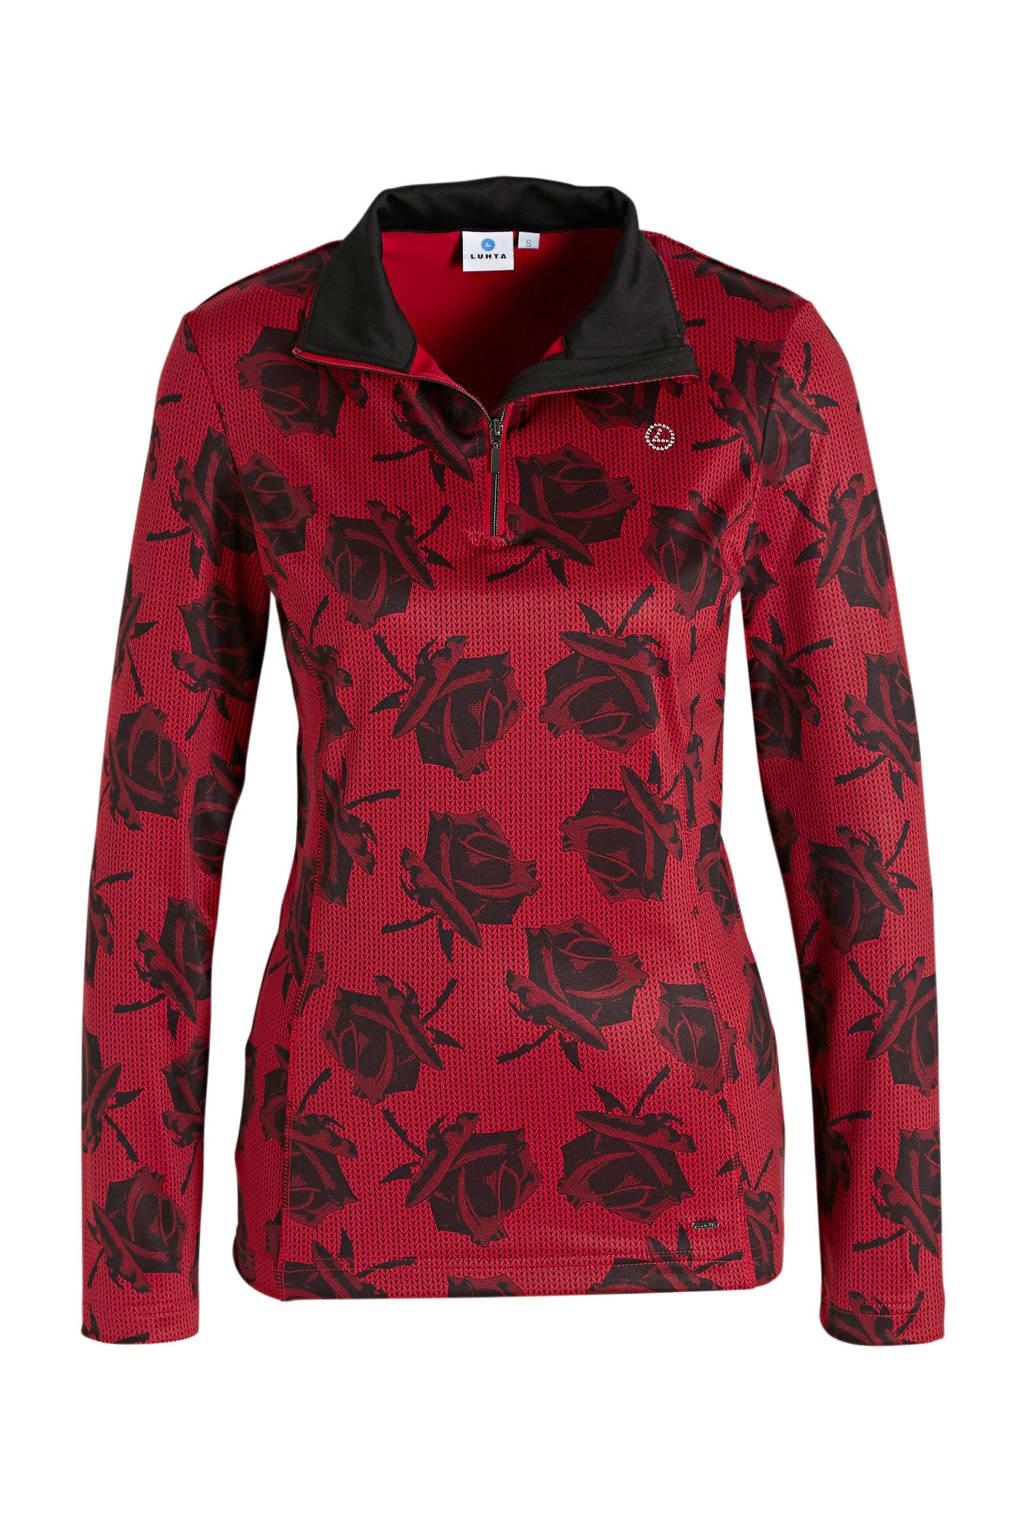 Luhta skipully Estby rood/zwart, Rood/zwart